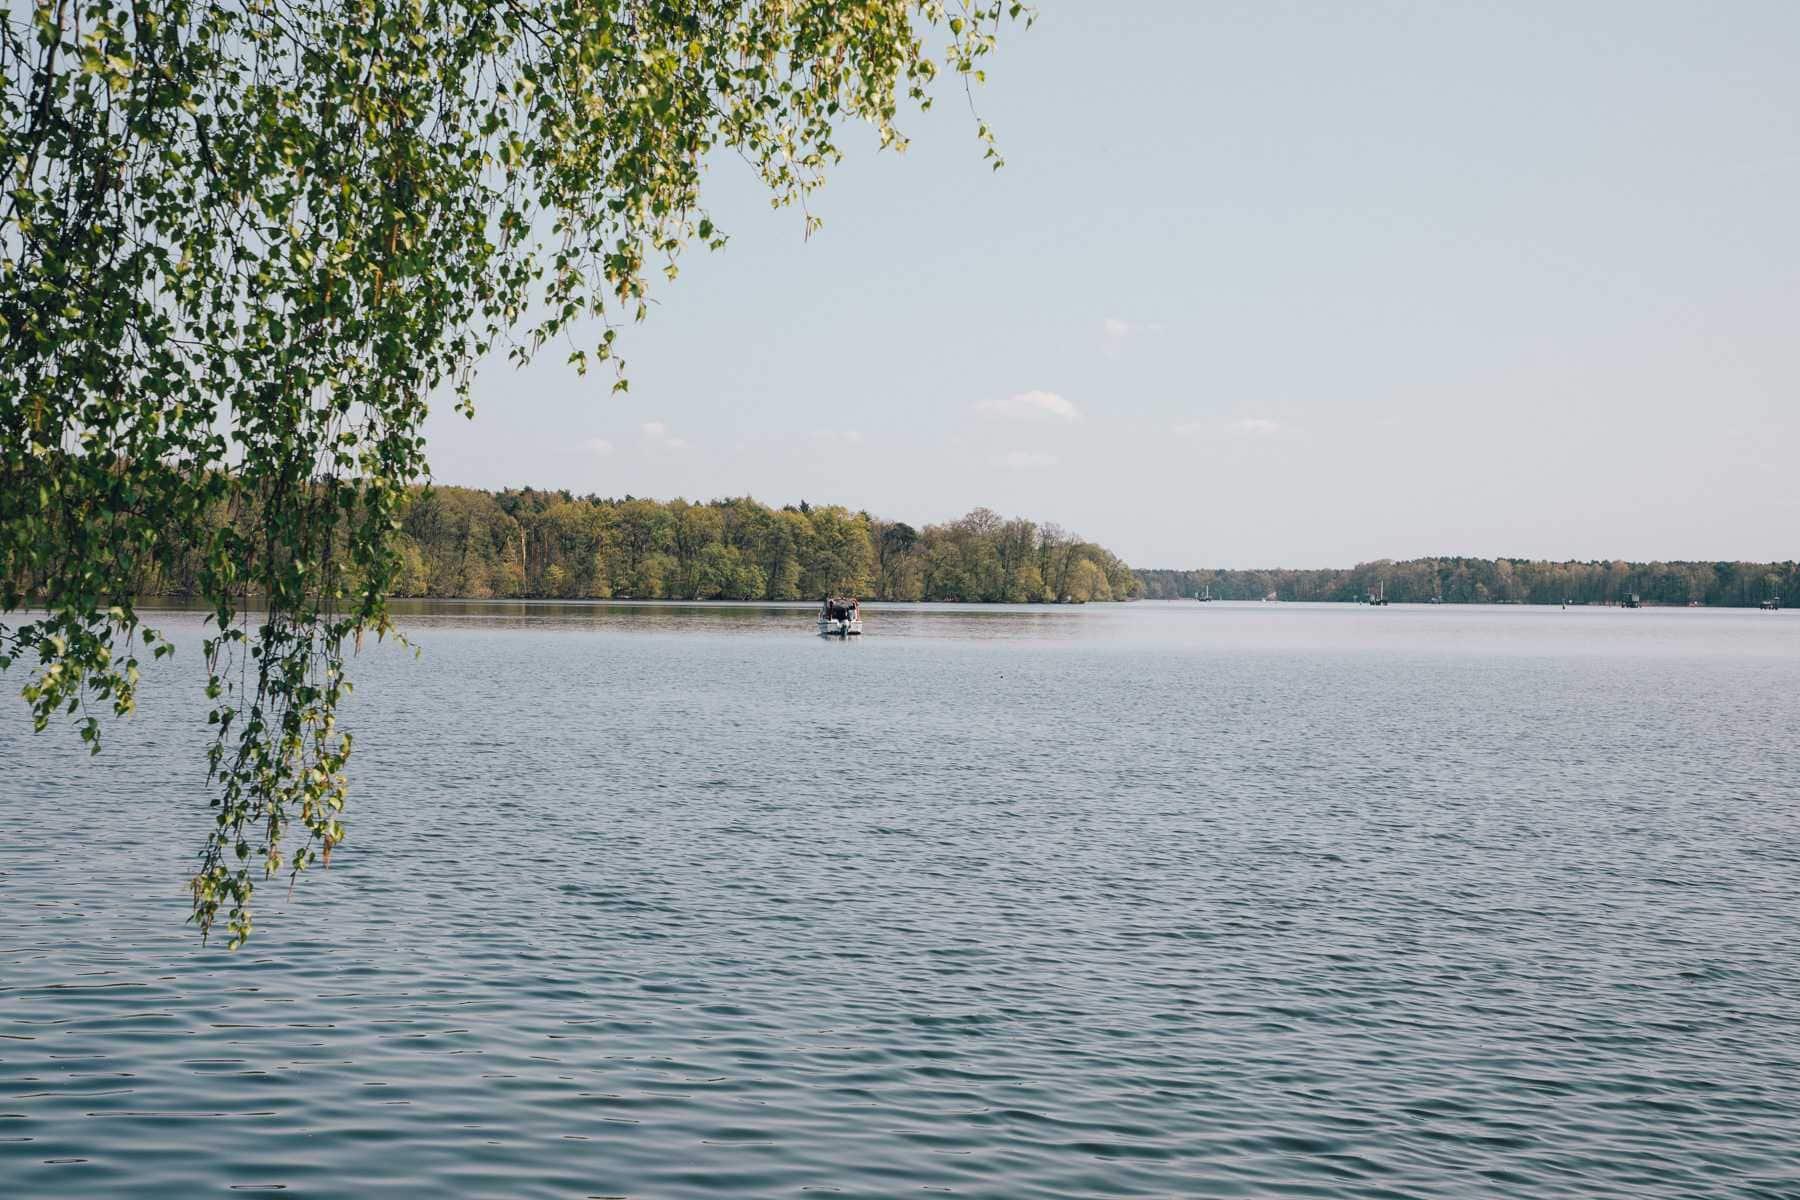 Cycle tour Müggelsee Bathing spots Berlin Dahme